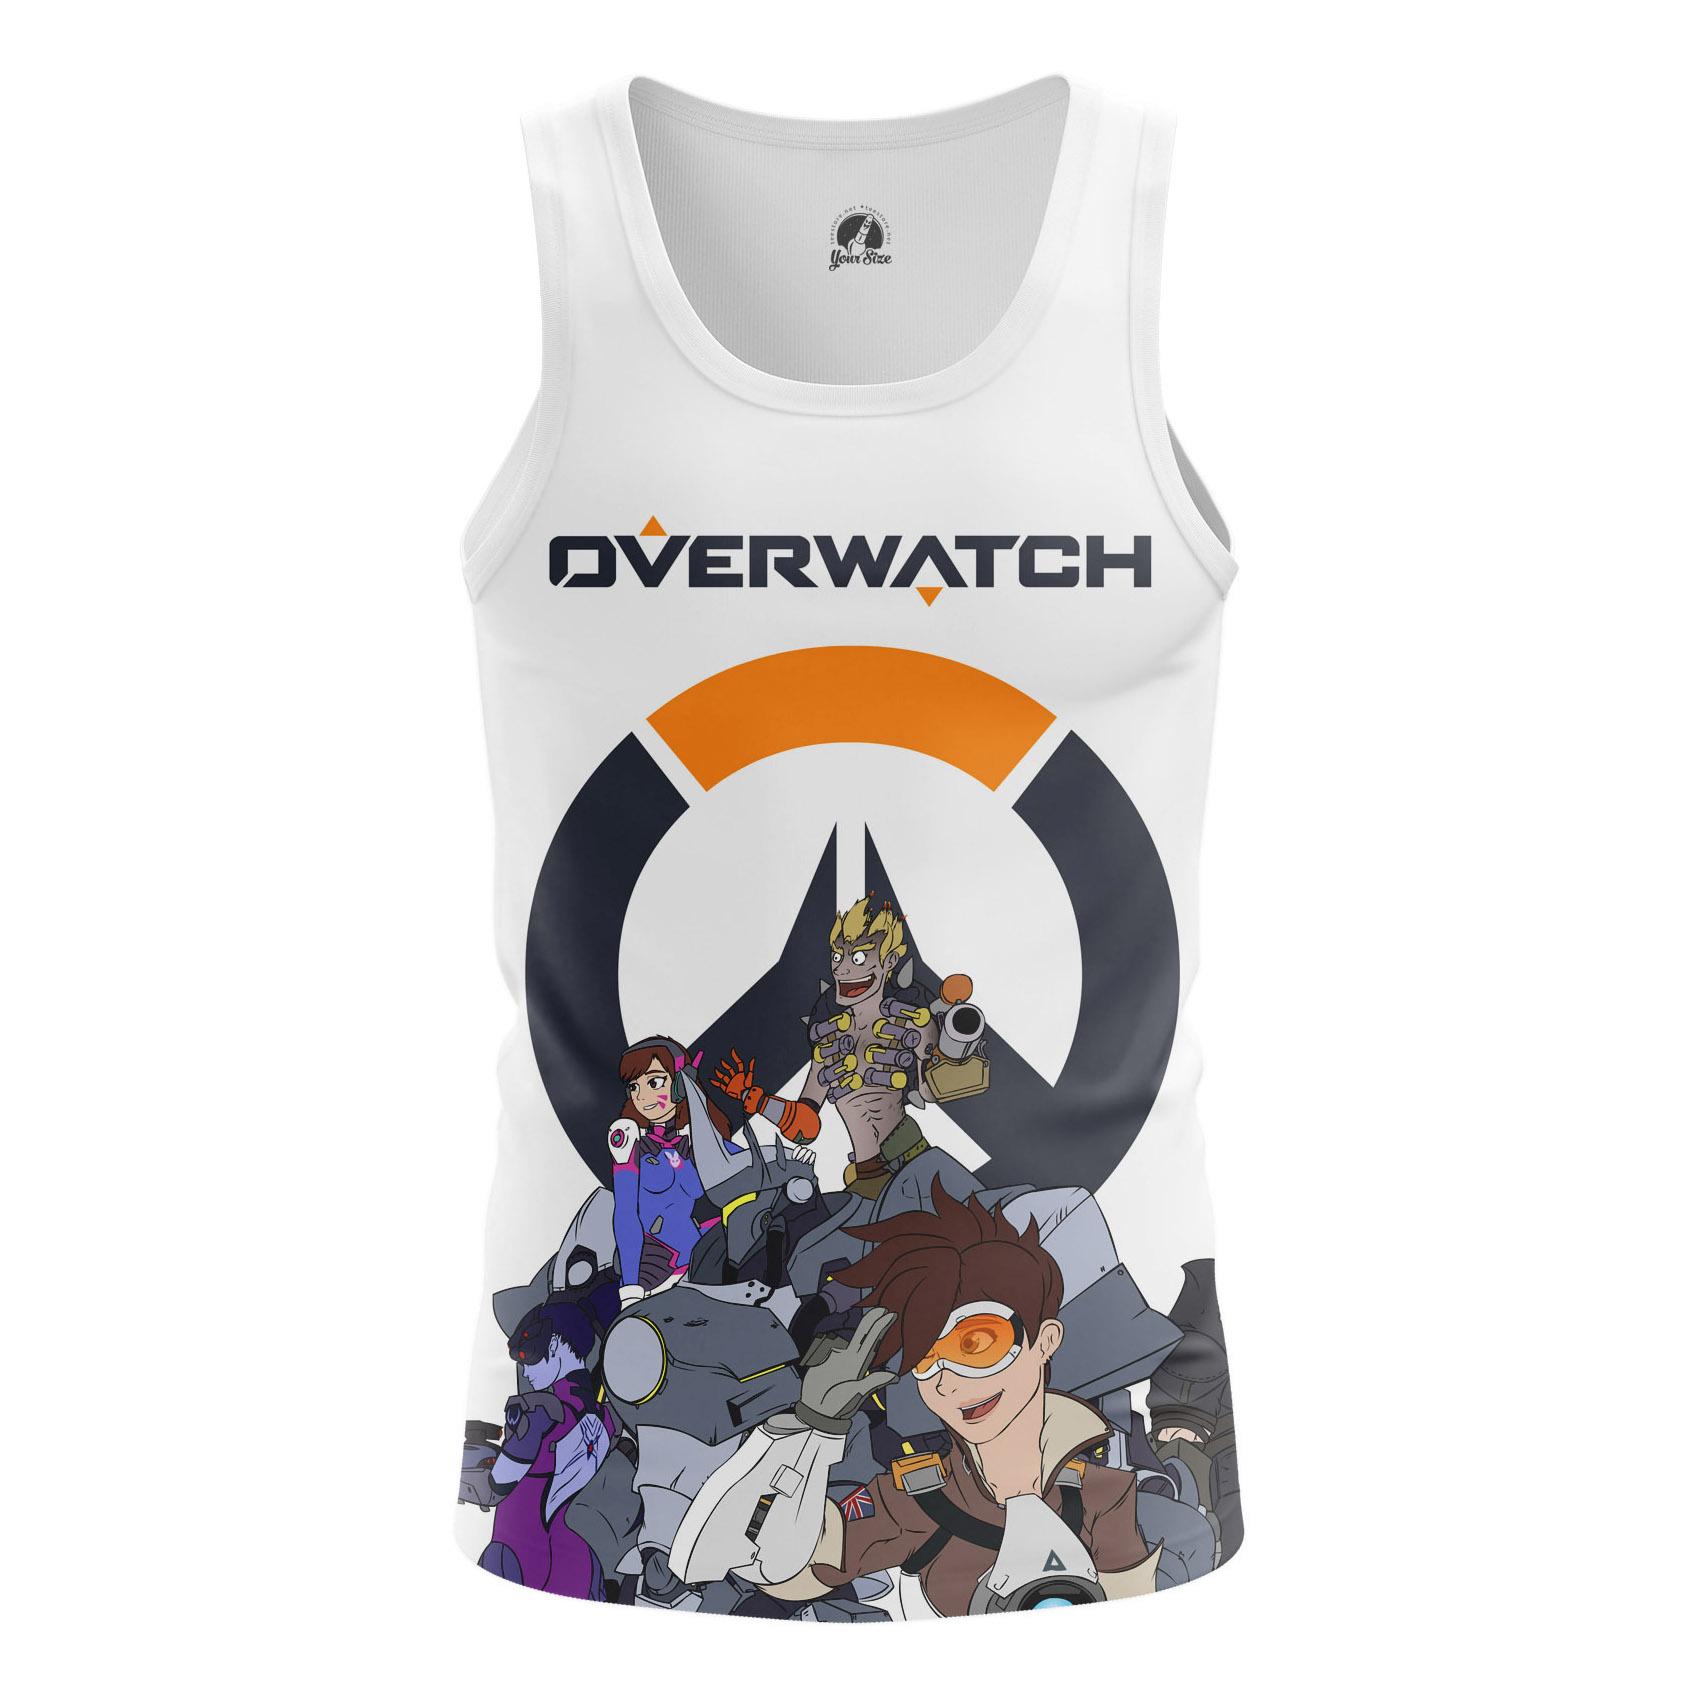 M-Tan-Overwatch_1482275397_469